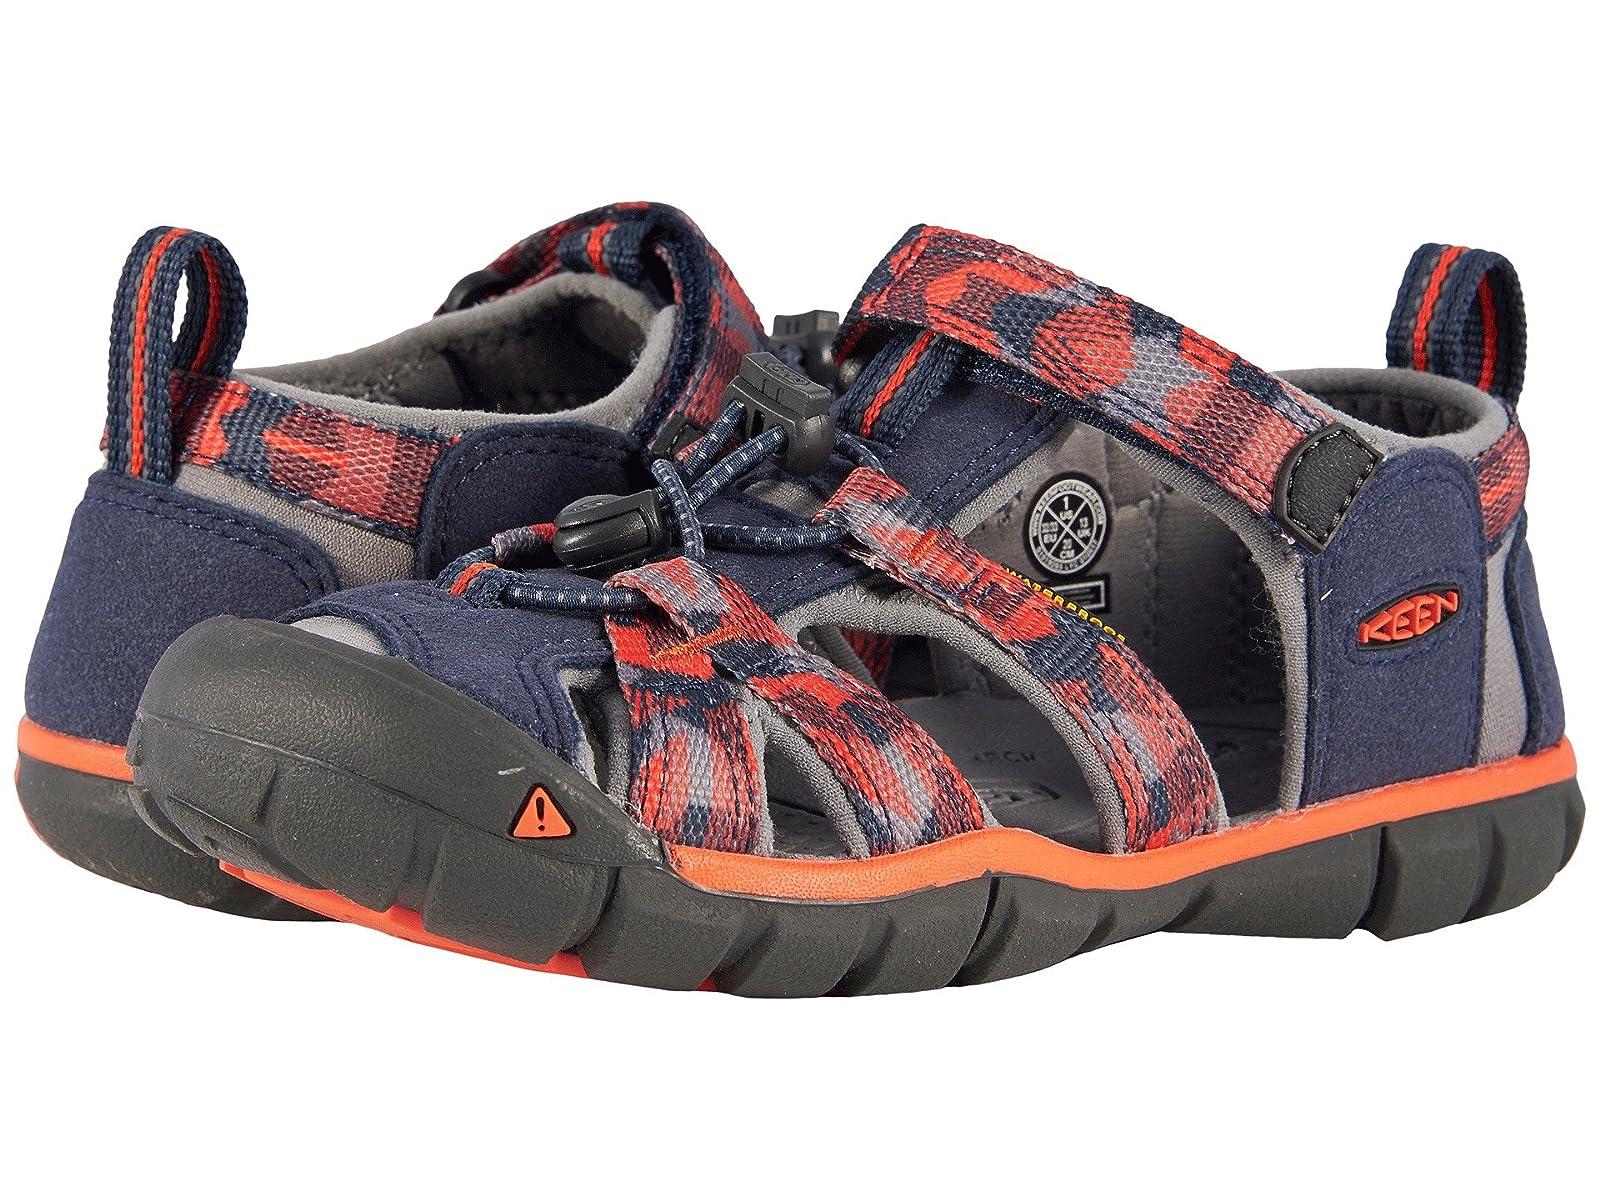 Keen Kids Seacamp II CNX (Little Kid/Big Kid)Atmospheric grades have affordable shoes